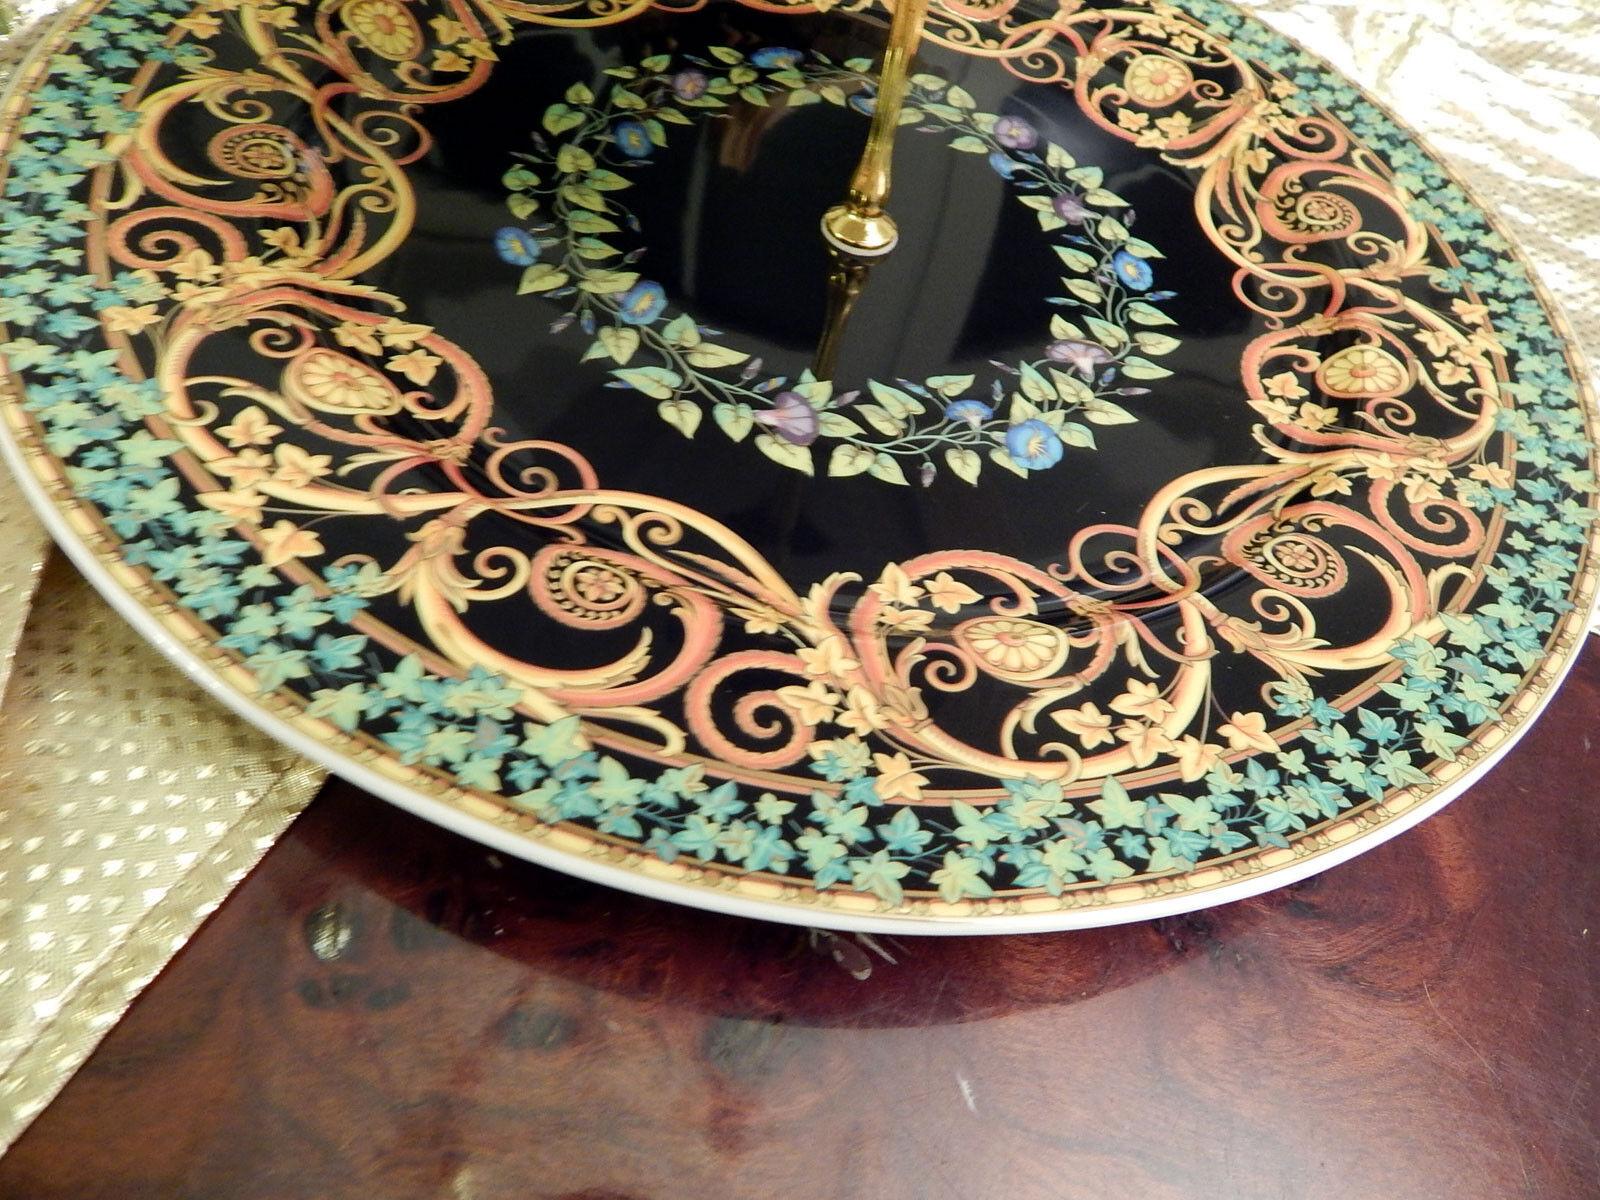 Edle riesige riesige riesige Etagere Tafelaufsatz 3stufig 31 cm Rosanthal Versace Gold Ivy 572871